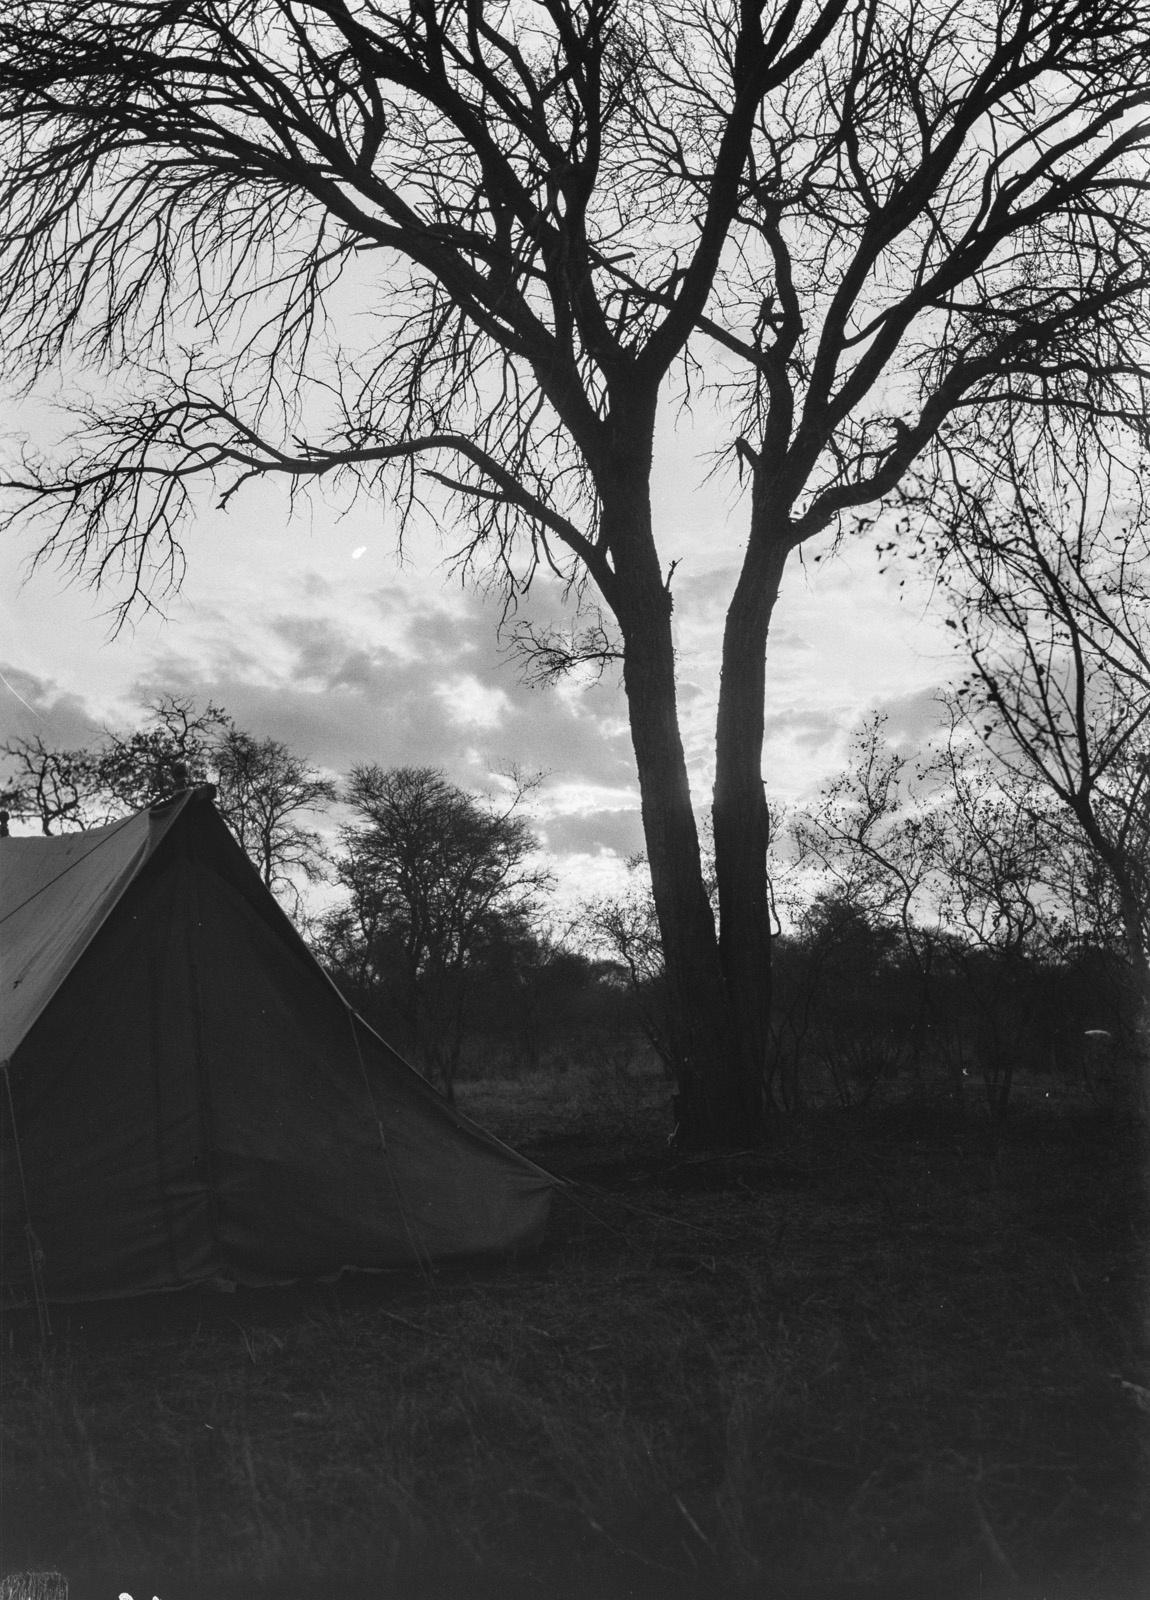 Бечуаналенд. Лагерь экспедиции